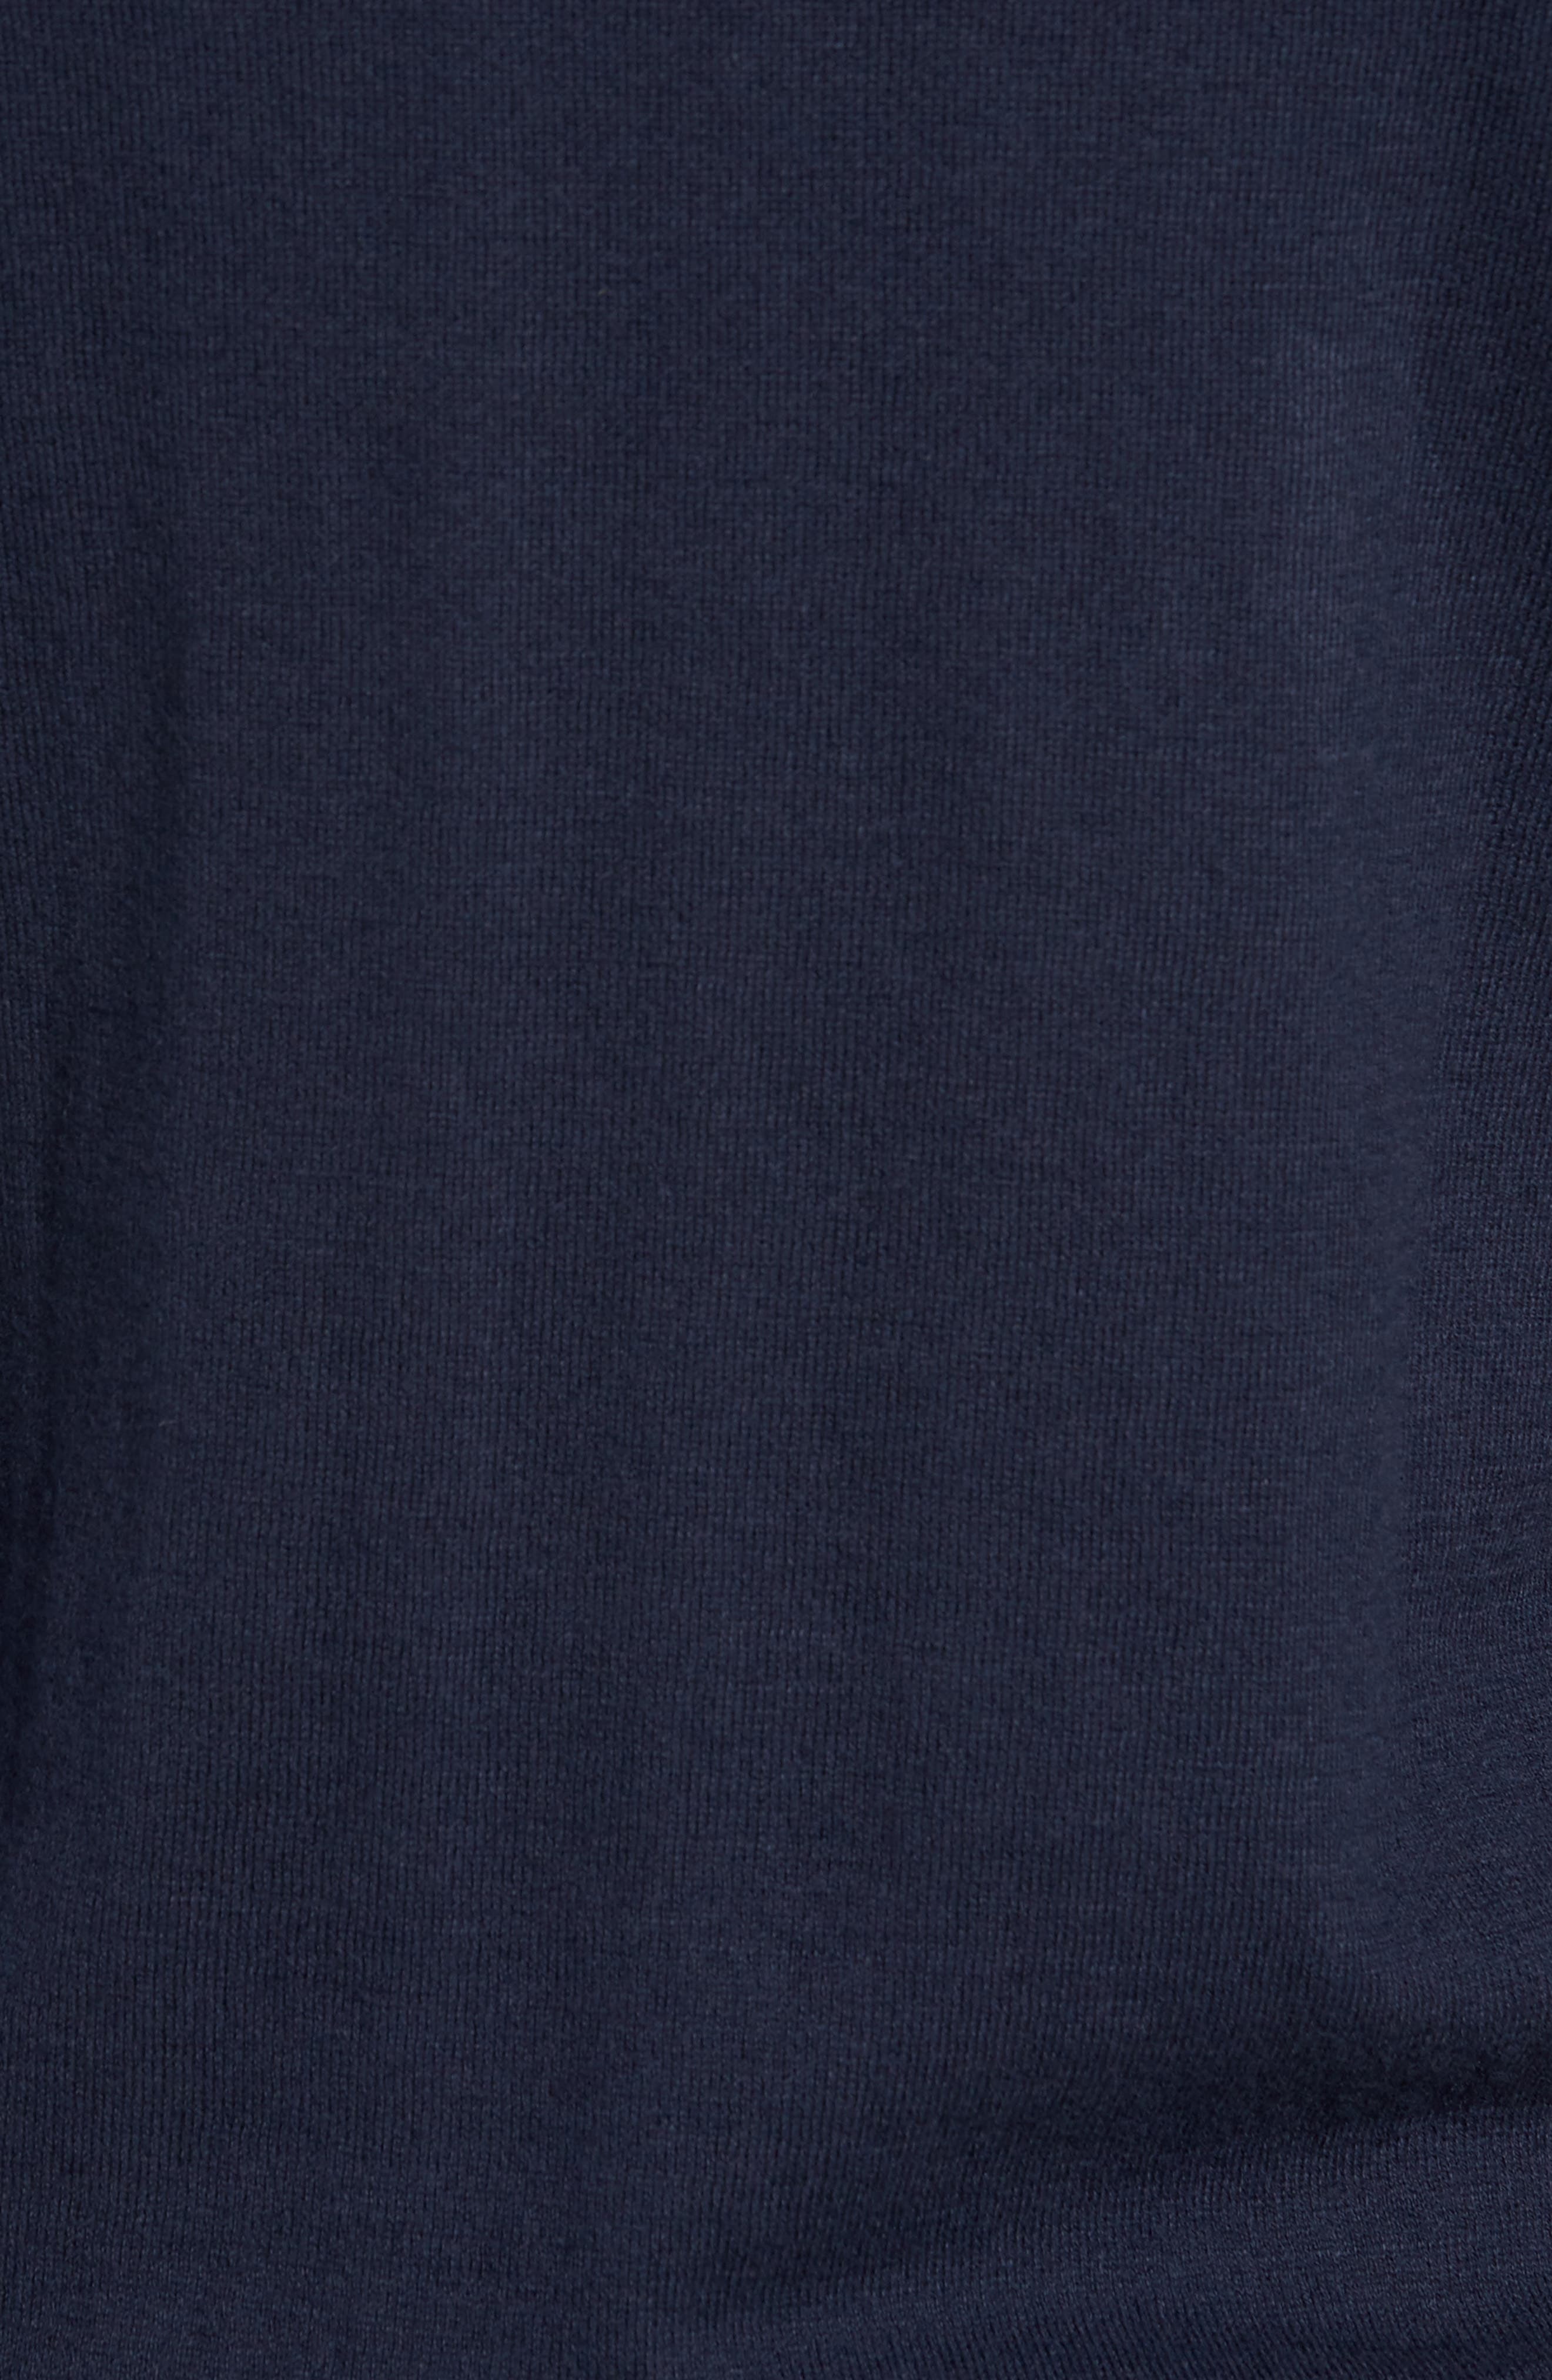 Colorblock Long Sleeve Polo,                             Alternate thumbnail 5, color,                             Navy